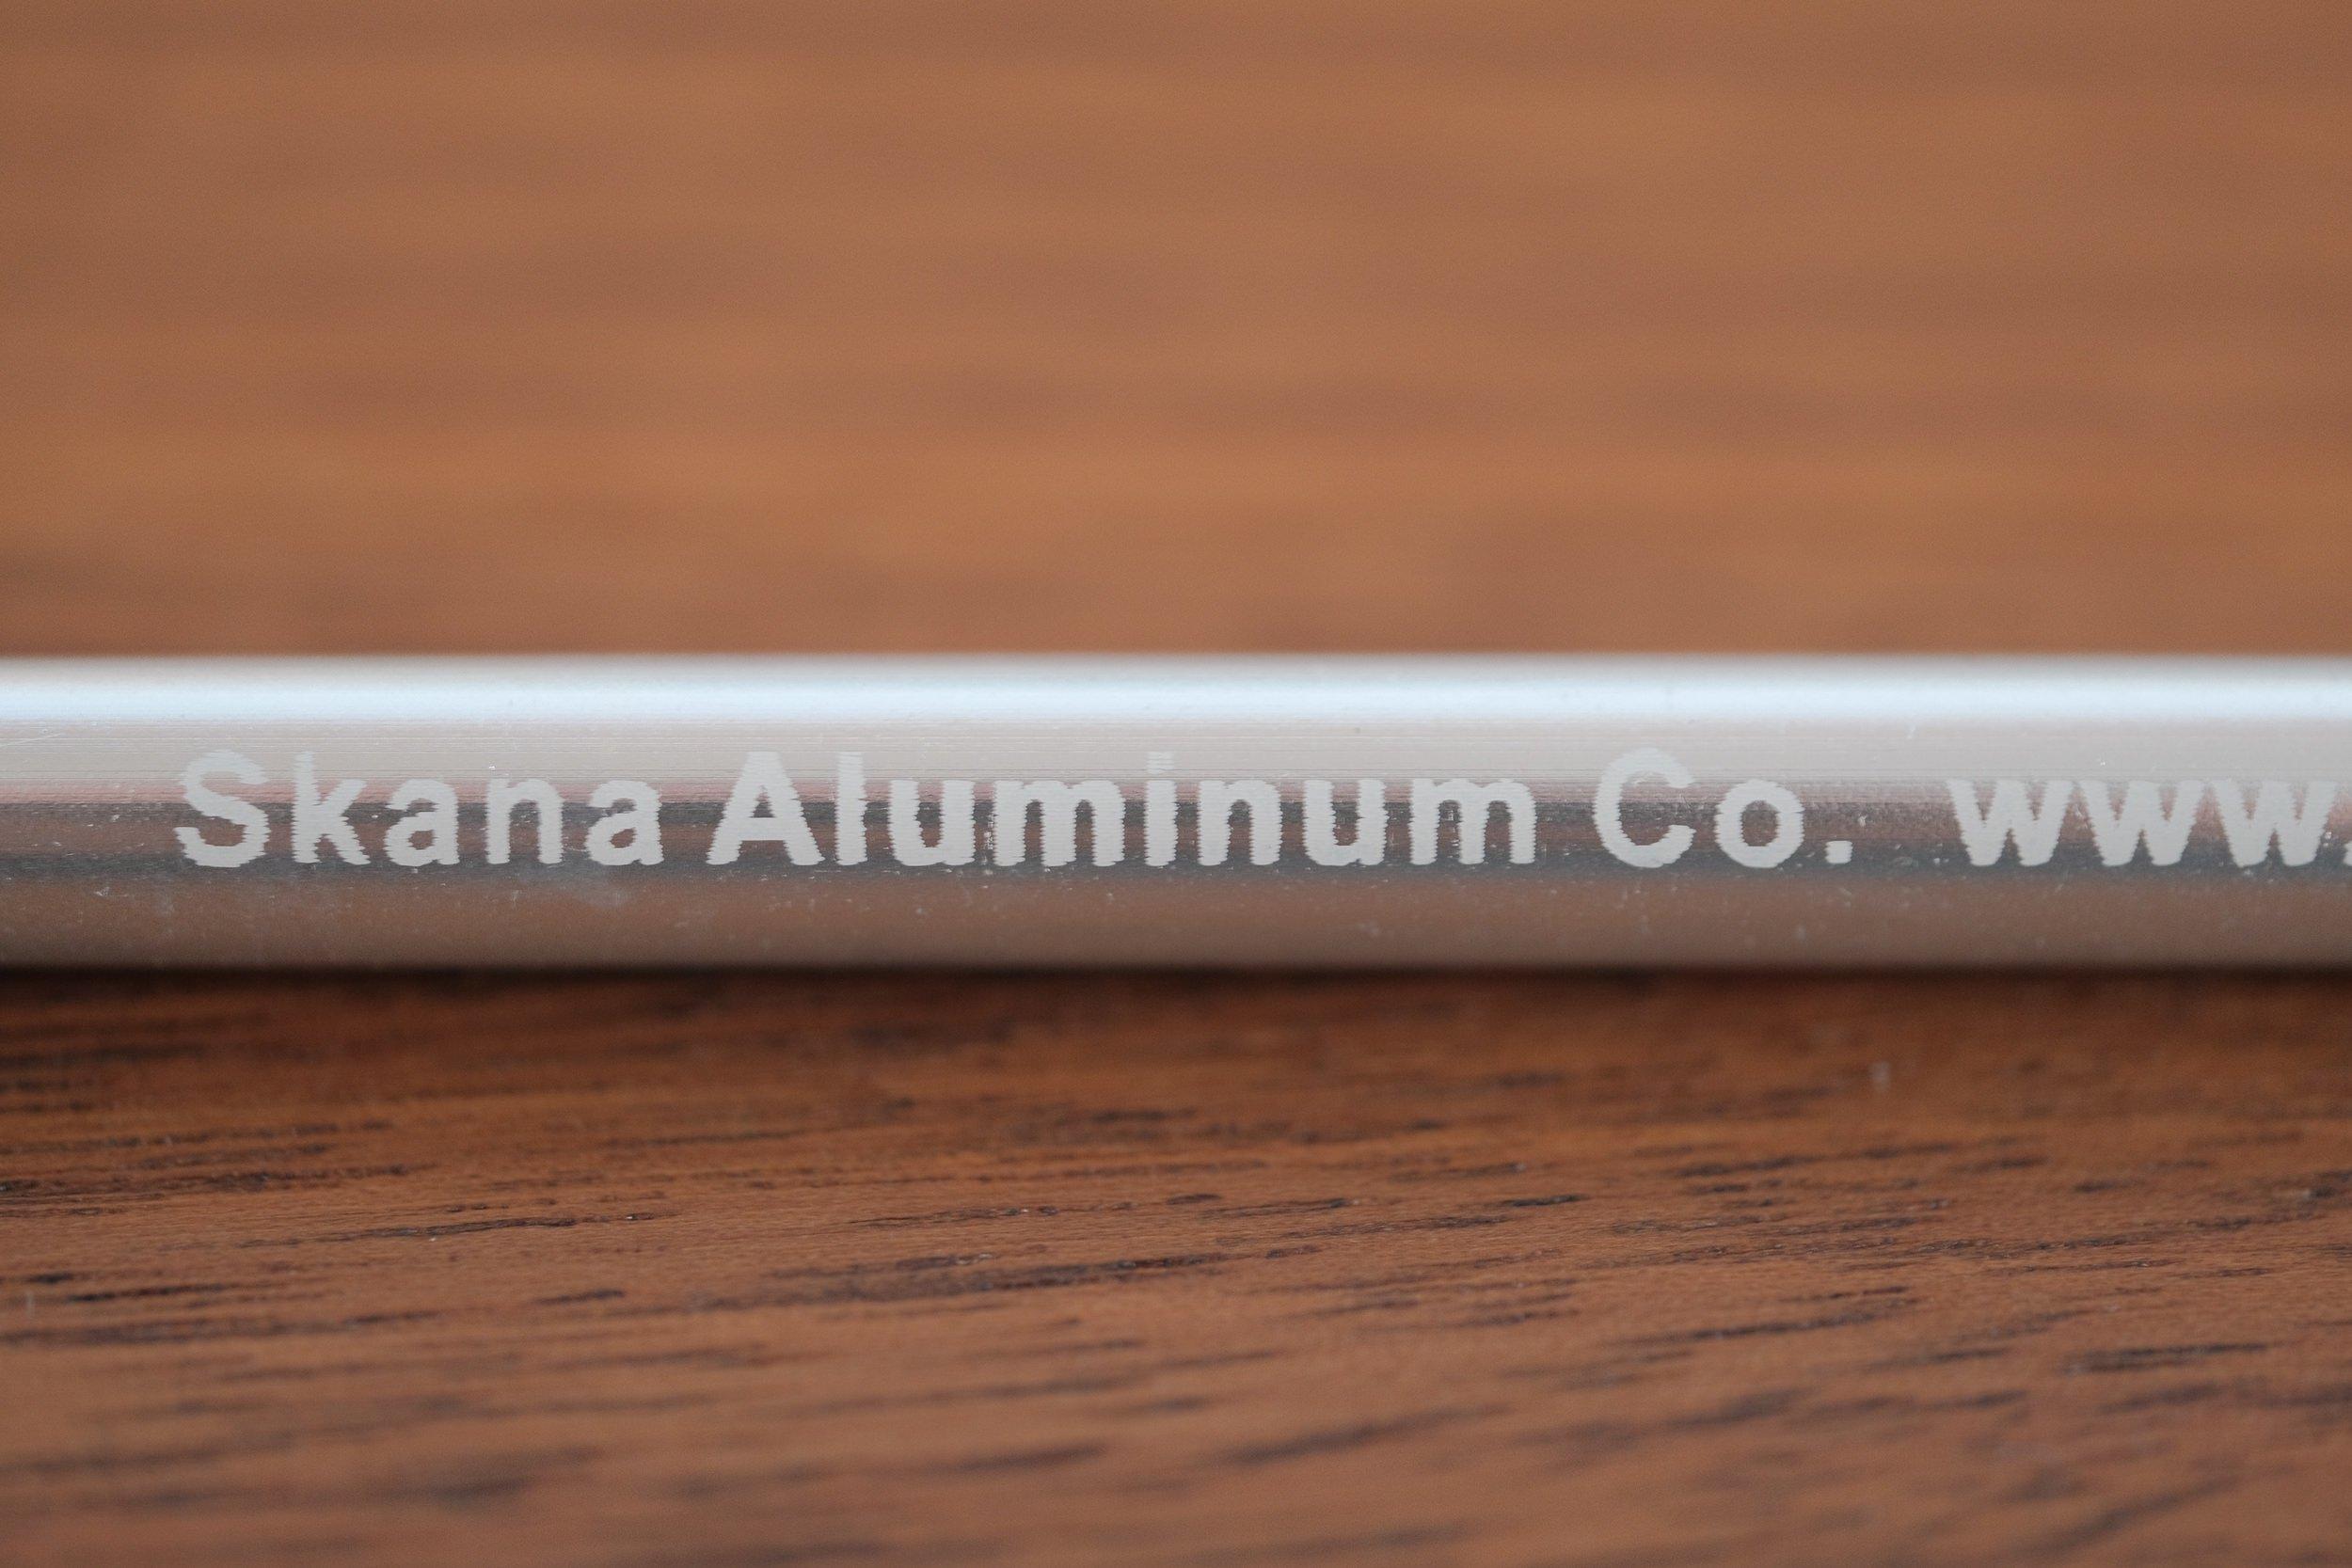 Sea-Straw Aluminum Straws with etching 08.JPG